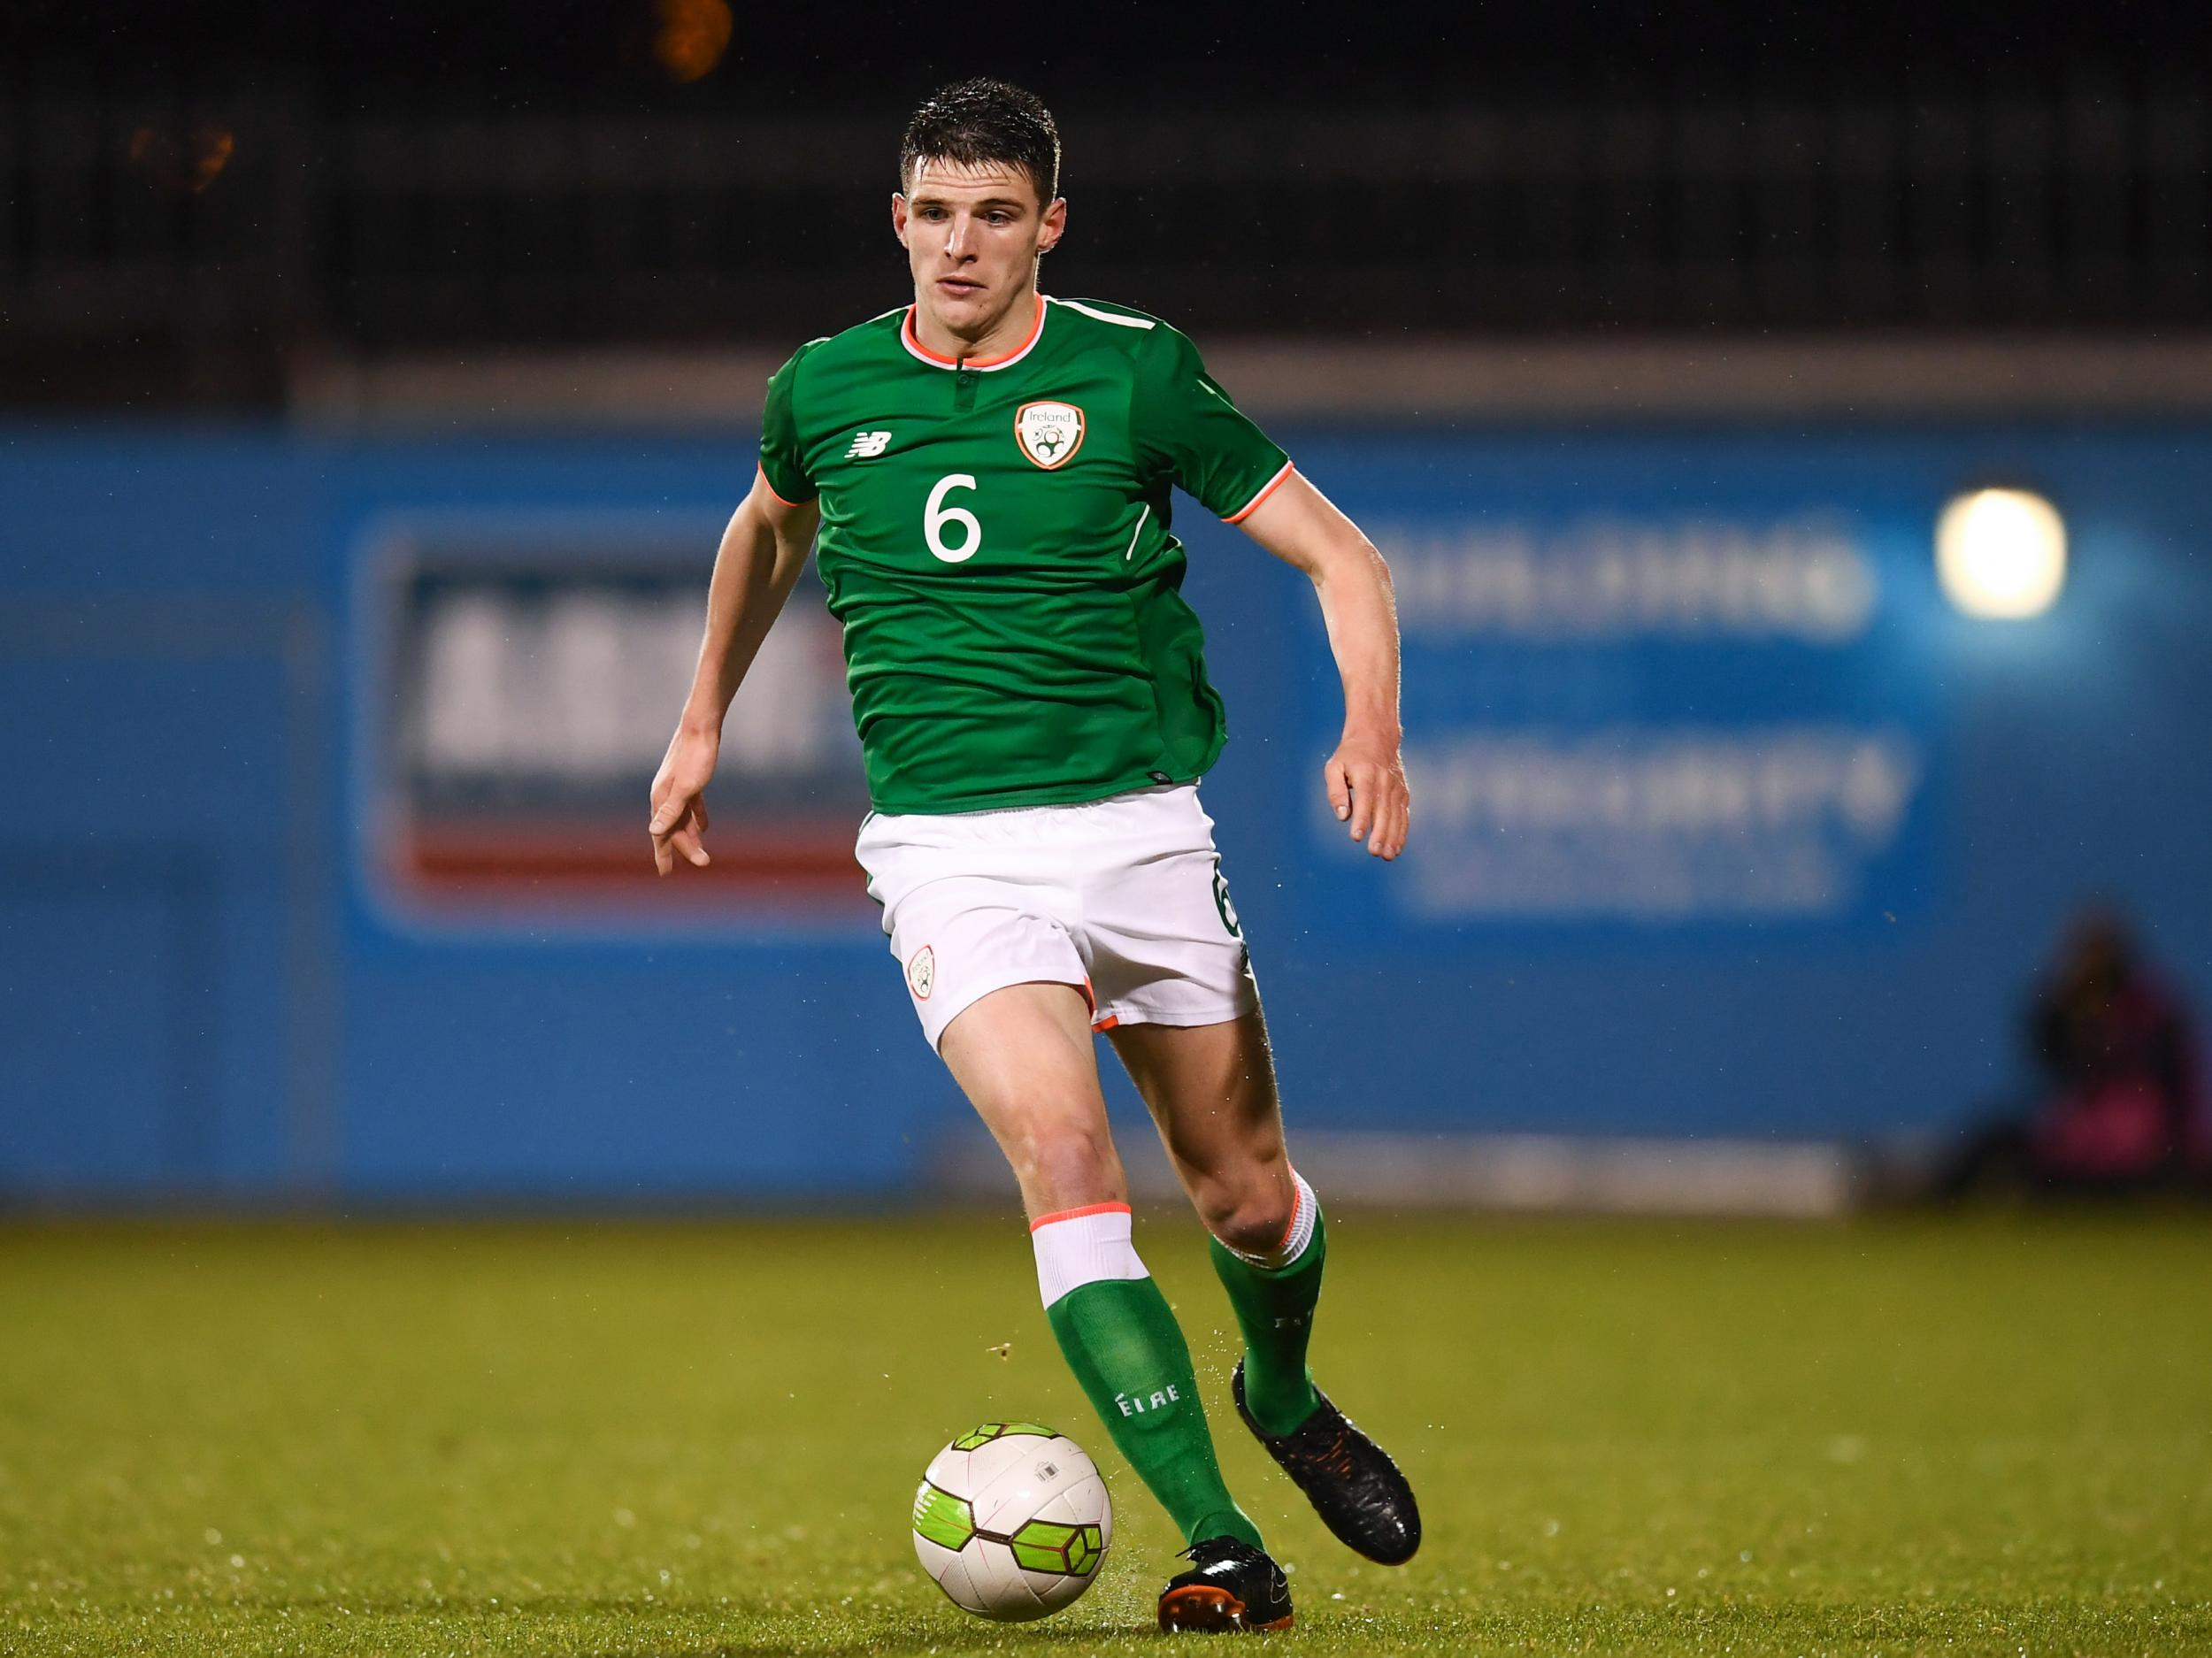 David Gold wants West Ham boss Manuel Pellegrini to turn Ireland international Declan Rice into England player